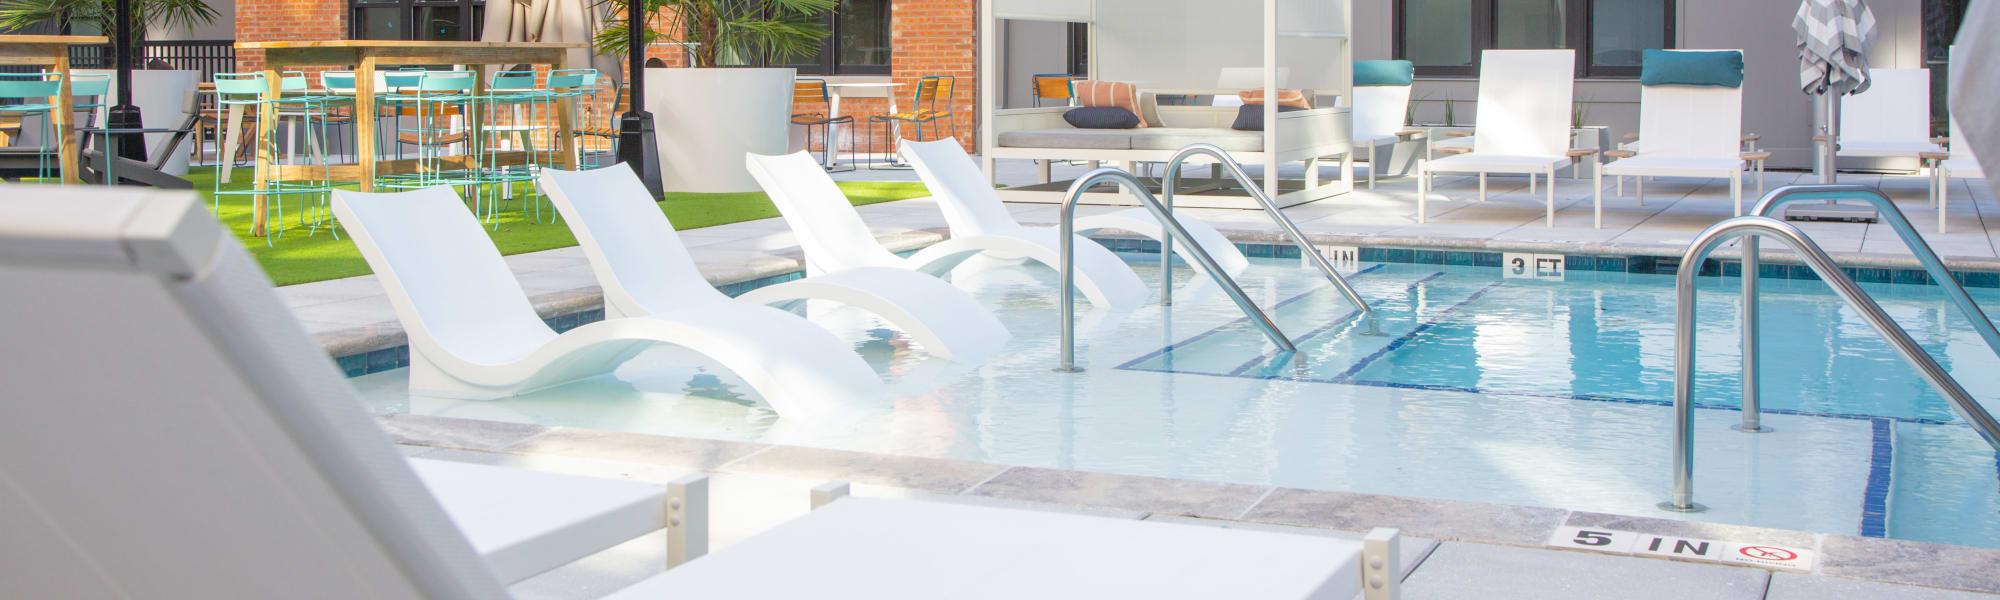 Urban luxury amenities at 511 Meeting in Charleston, South Carolina